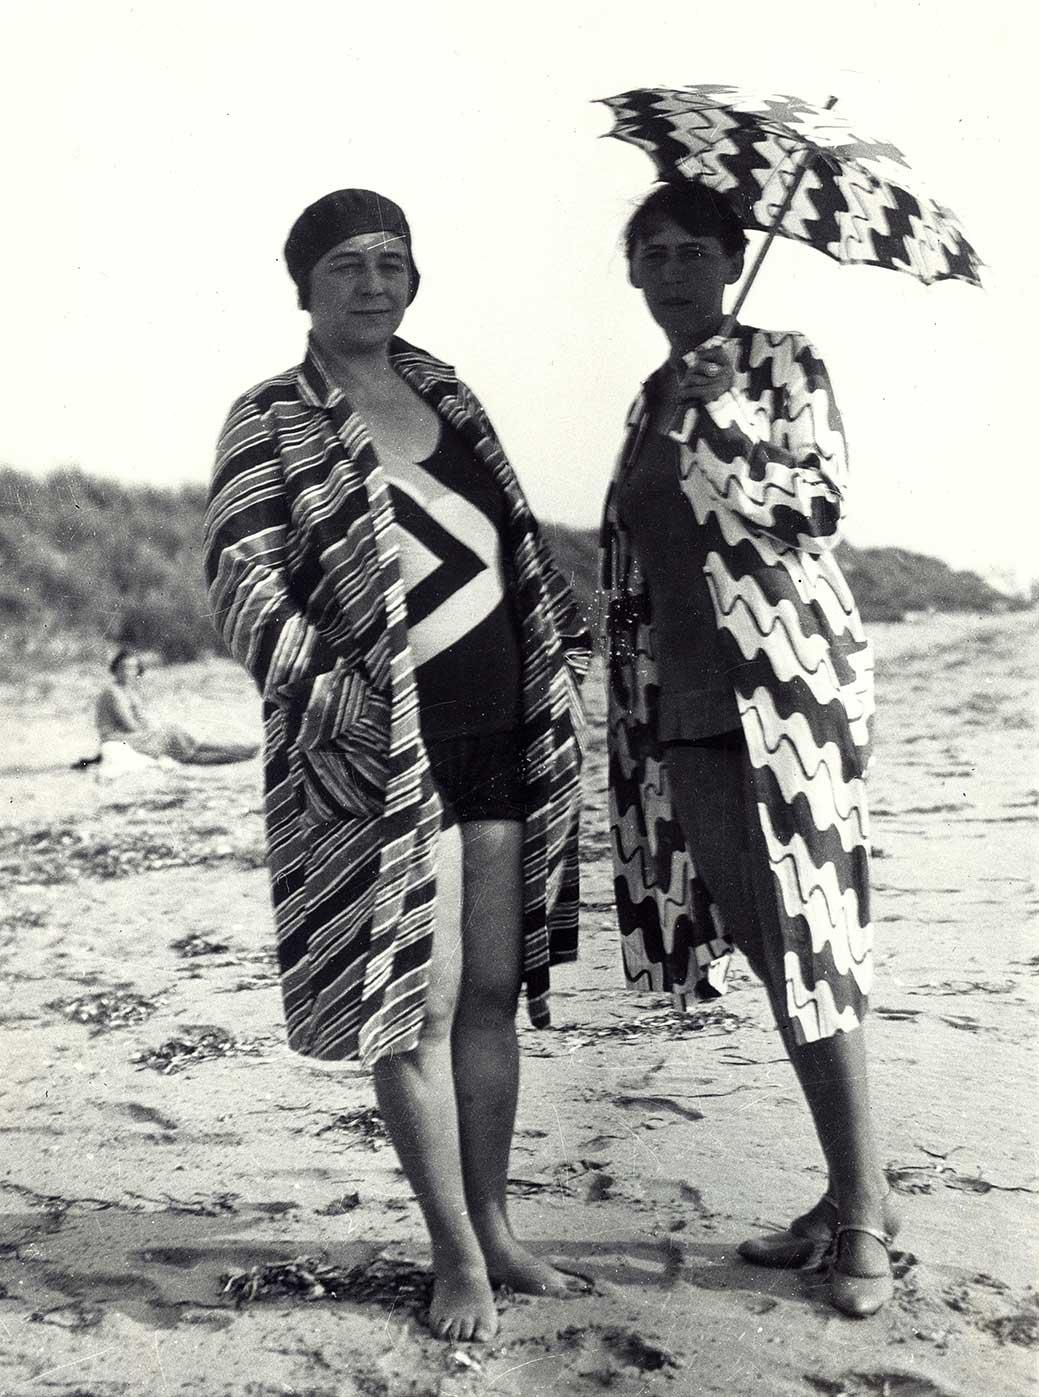 Sophie Taeuber-Arp und Sonia Delaunay in der Bretagne, 1930/1934